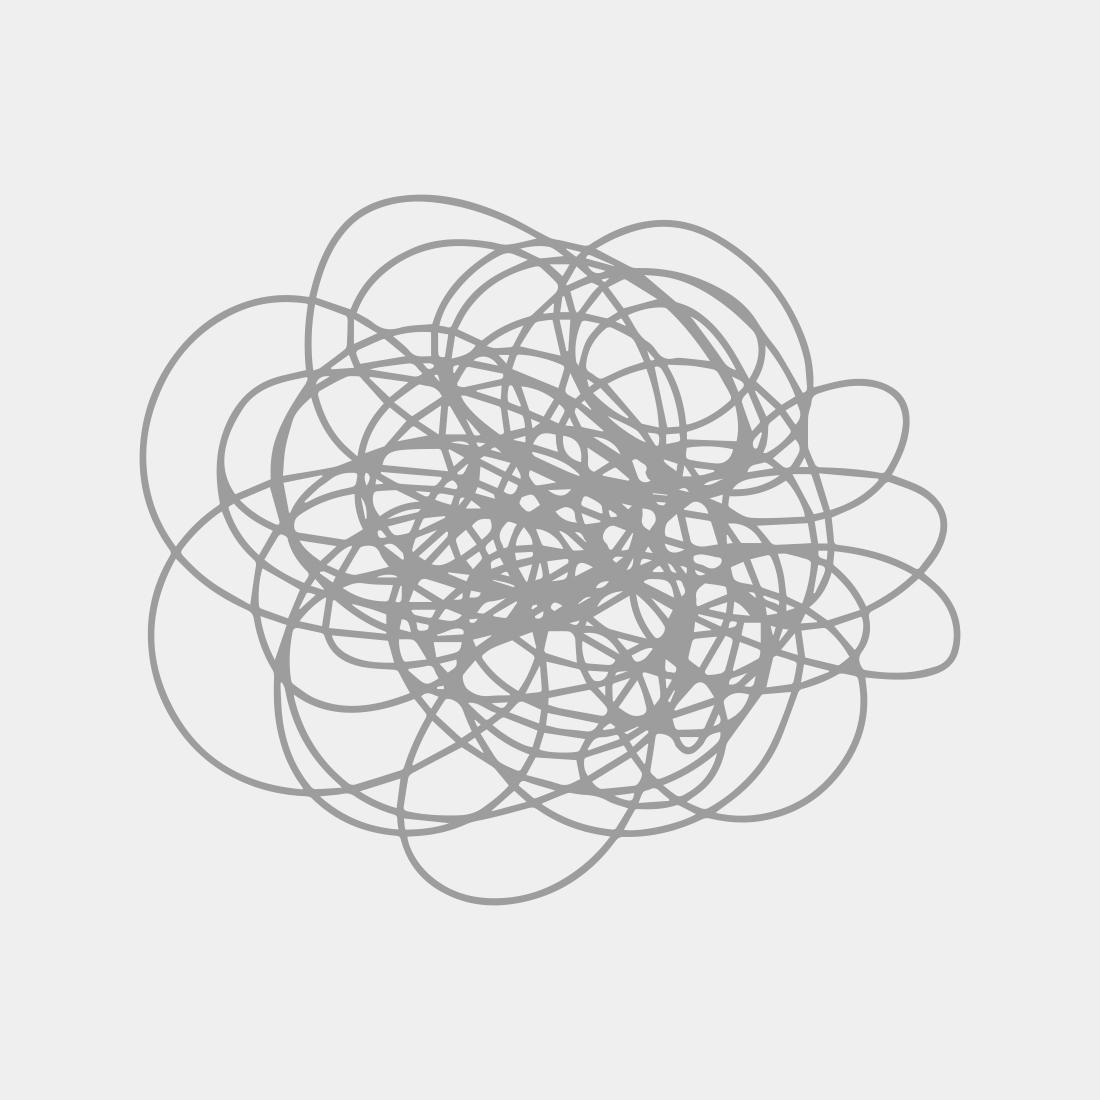 Albert Irvin OBE RA Untitled opus w.11 (framed)